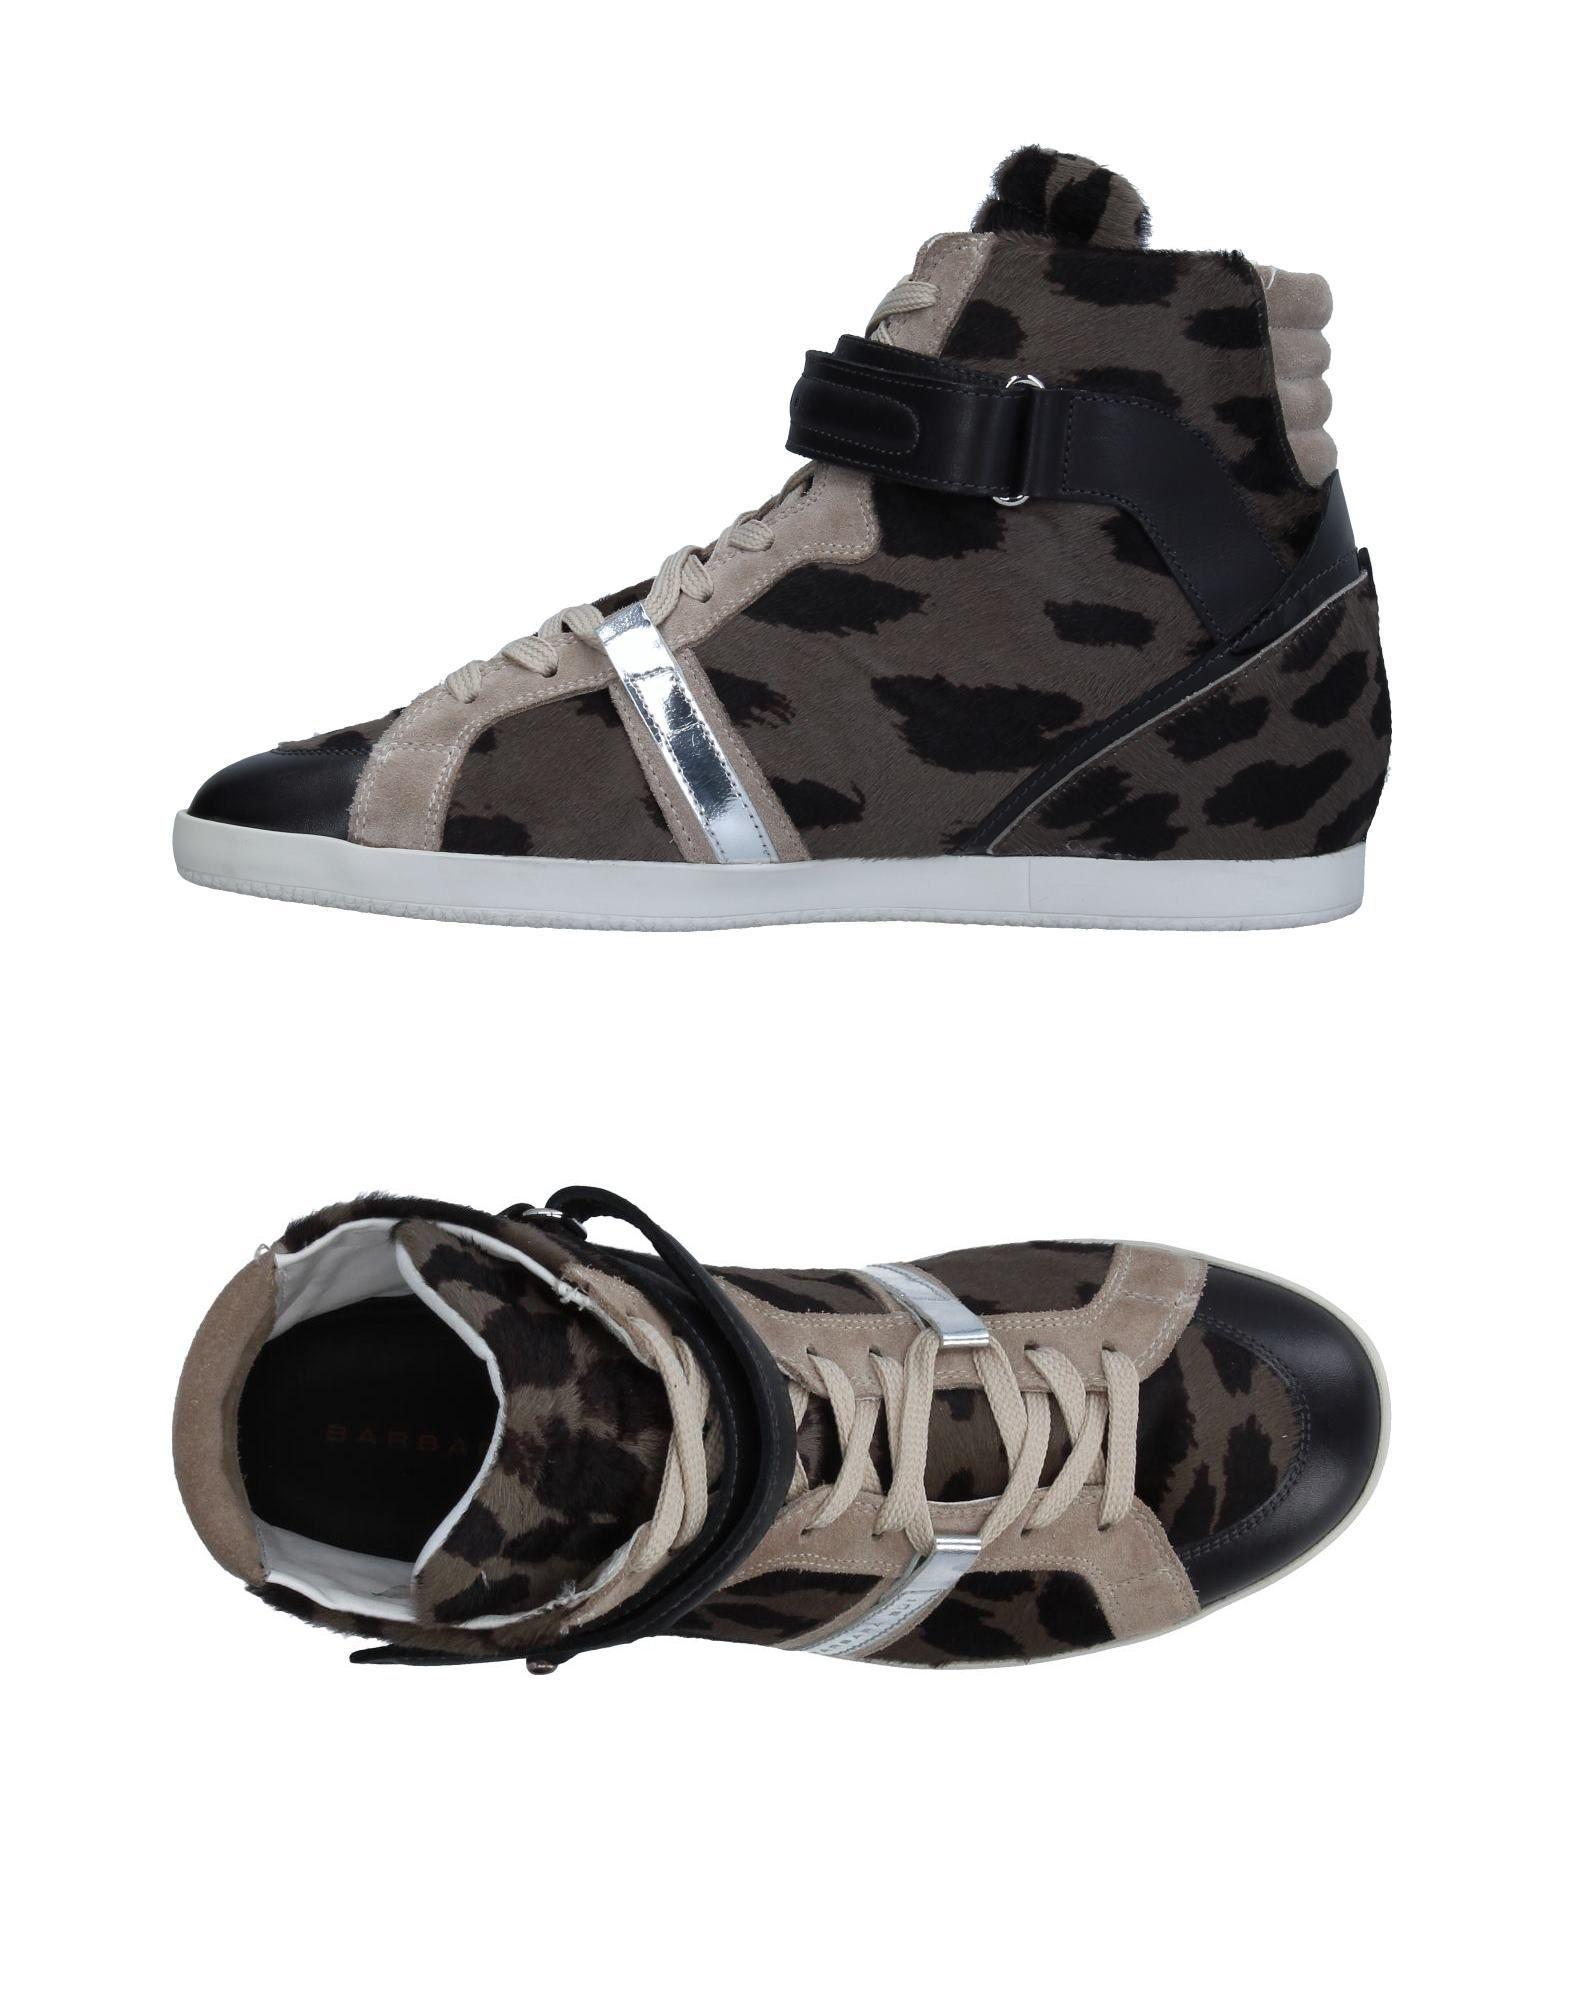 BARBARA BUI Damen High Sneakers & Tennisschuhe Farbe Militärgrün Größe 13